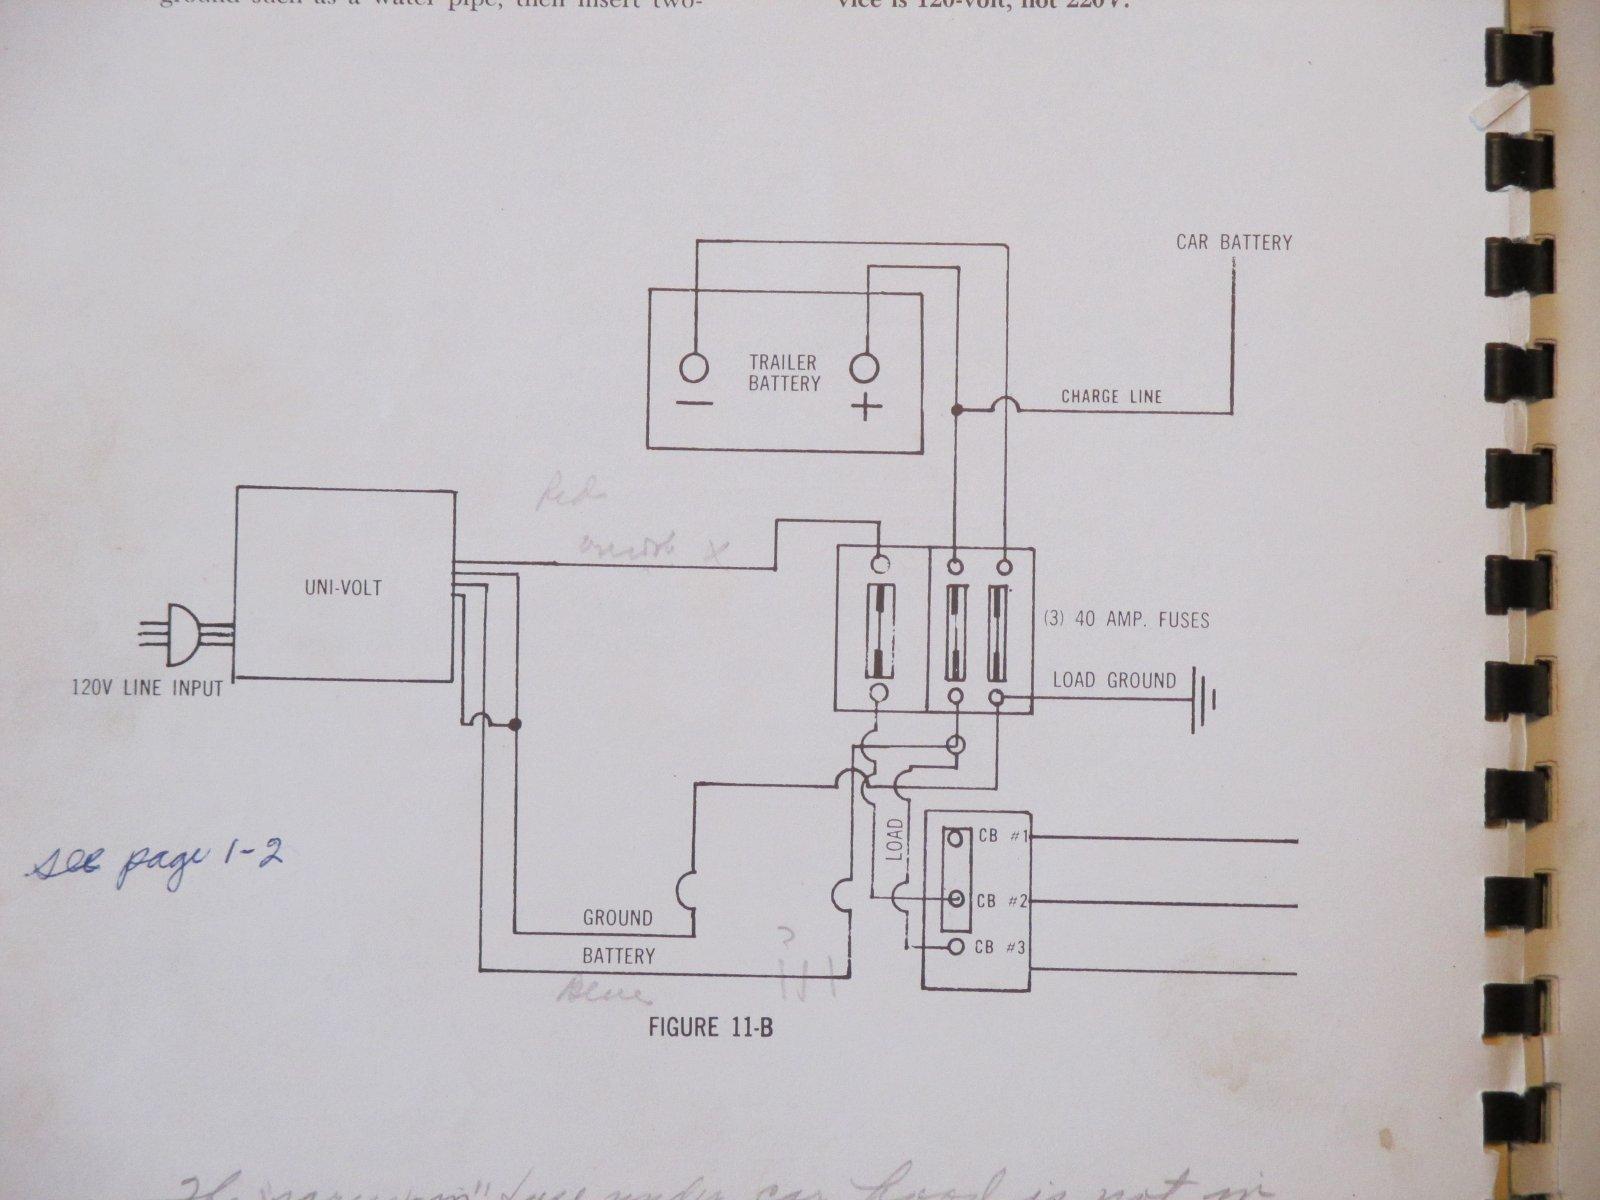 Click image for larger version  Name:1404 Univolt Wiring Diagram.jpg Views:1460 Size:180.7 KB ID:218455